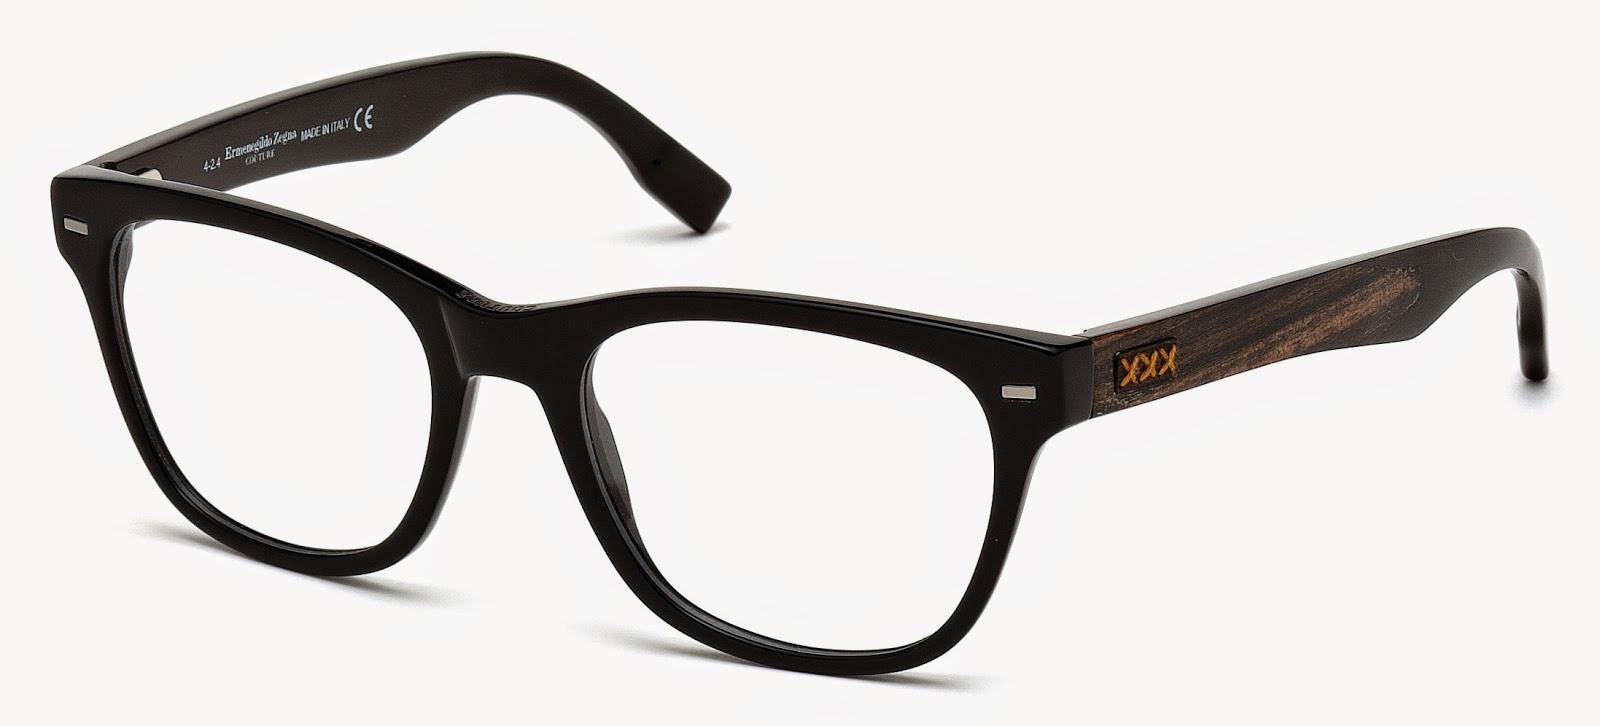 Ermenegildo Zegna and Marcolin Launch New Eyewear Collection